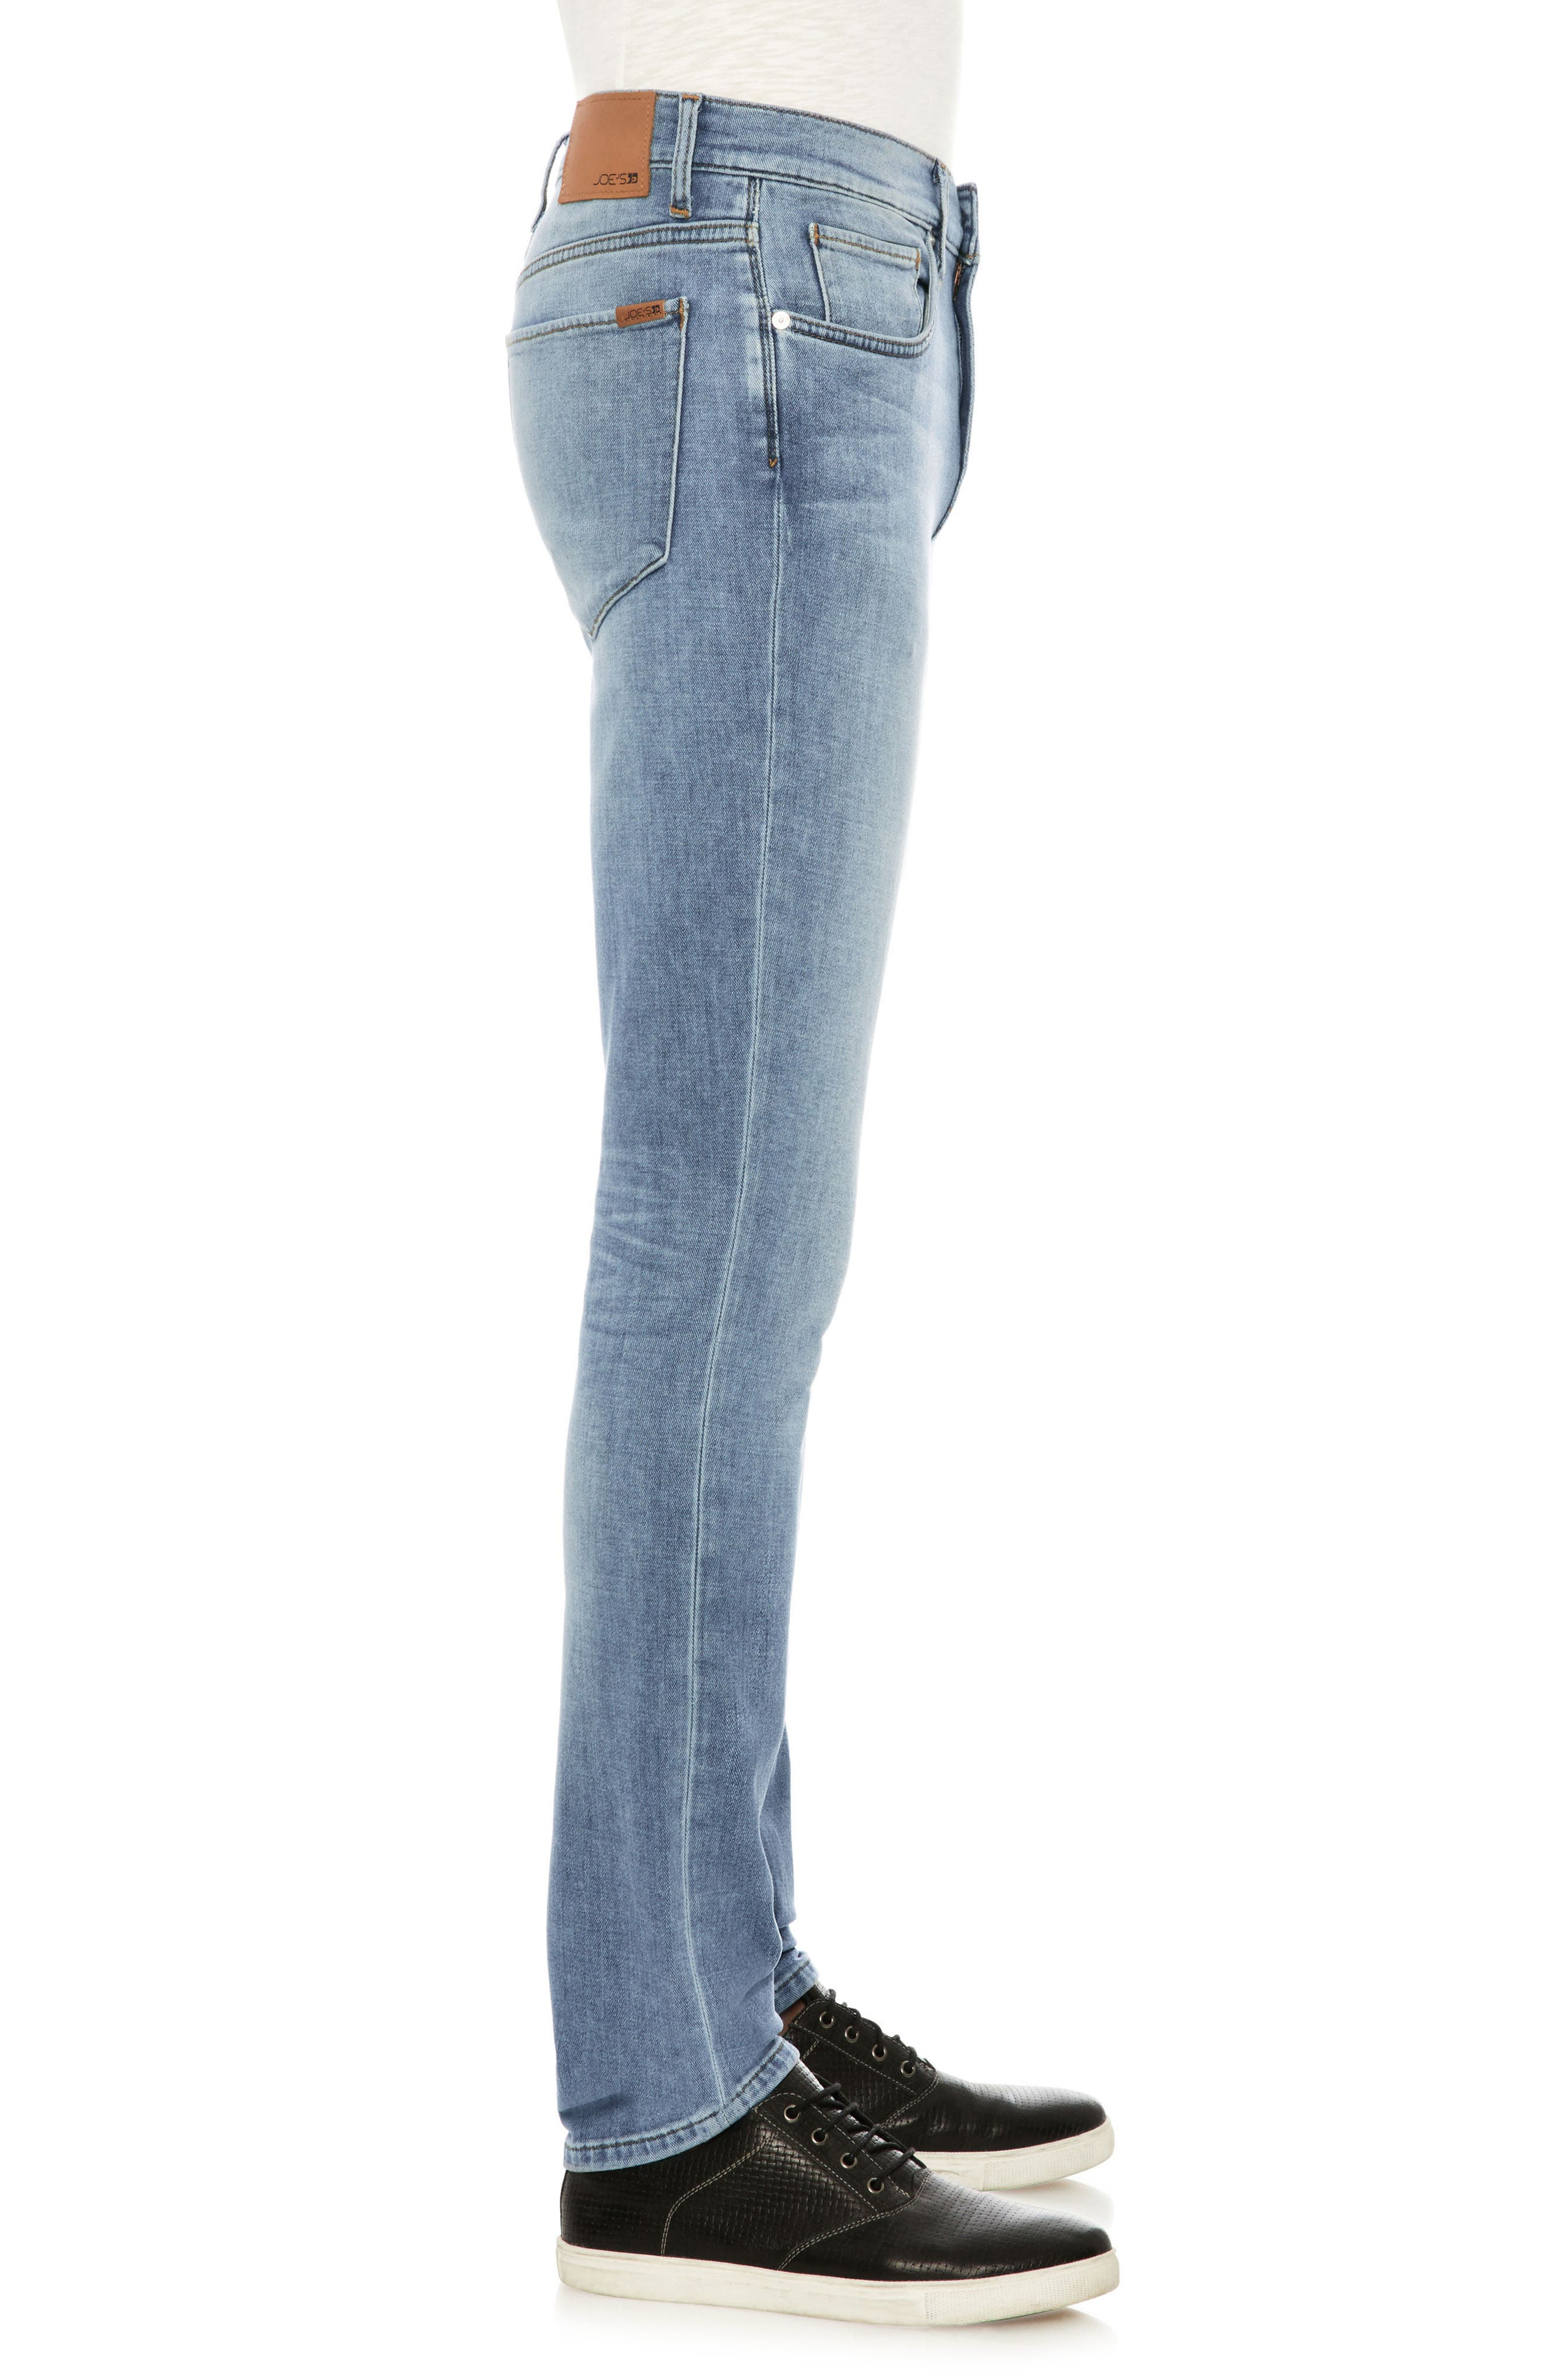 Legend Skinny Fit Jeans,                             Alternate thumbnail 3, color,                             451